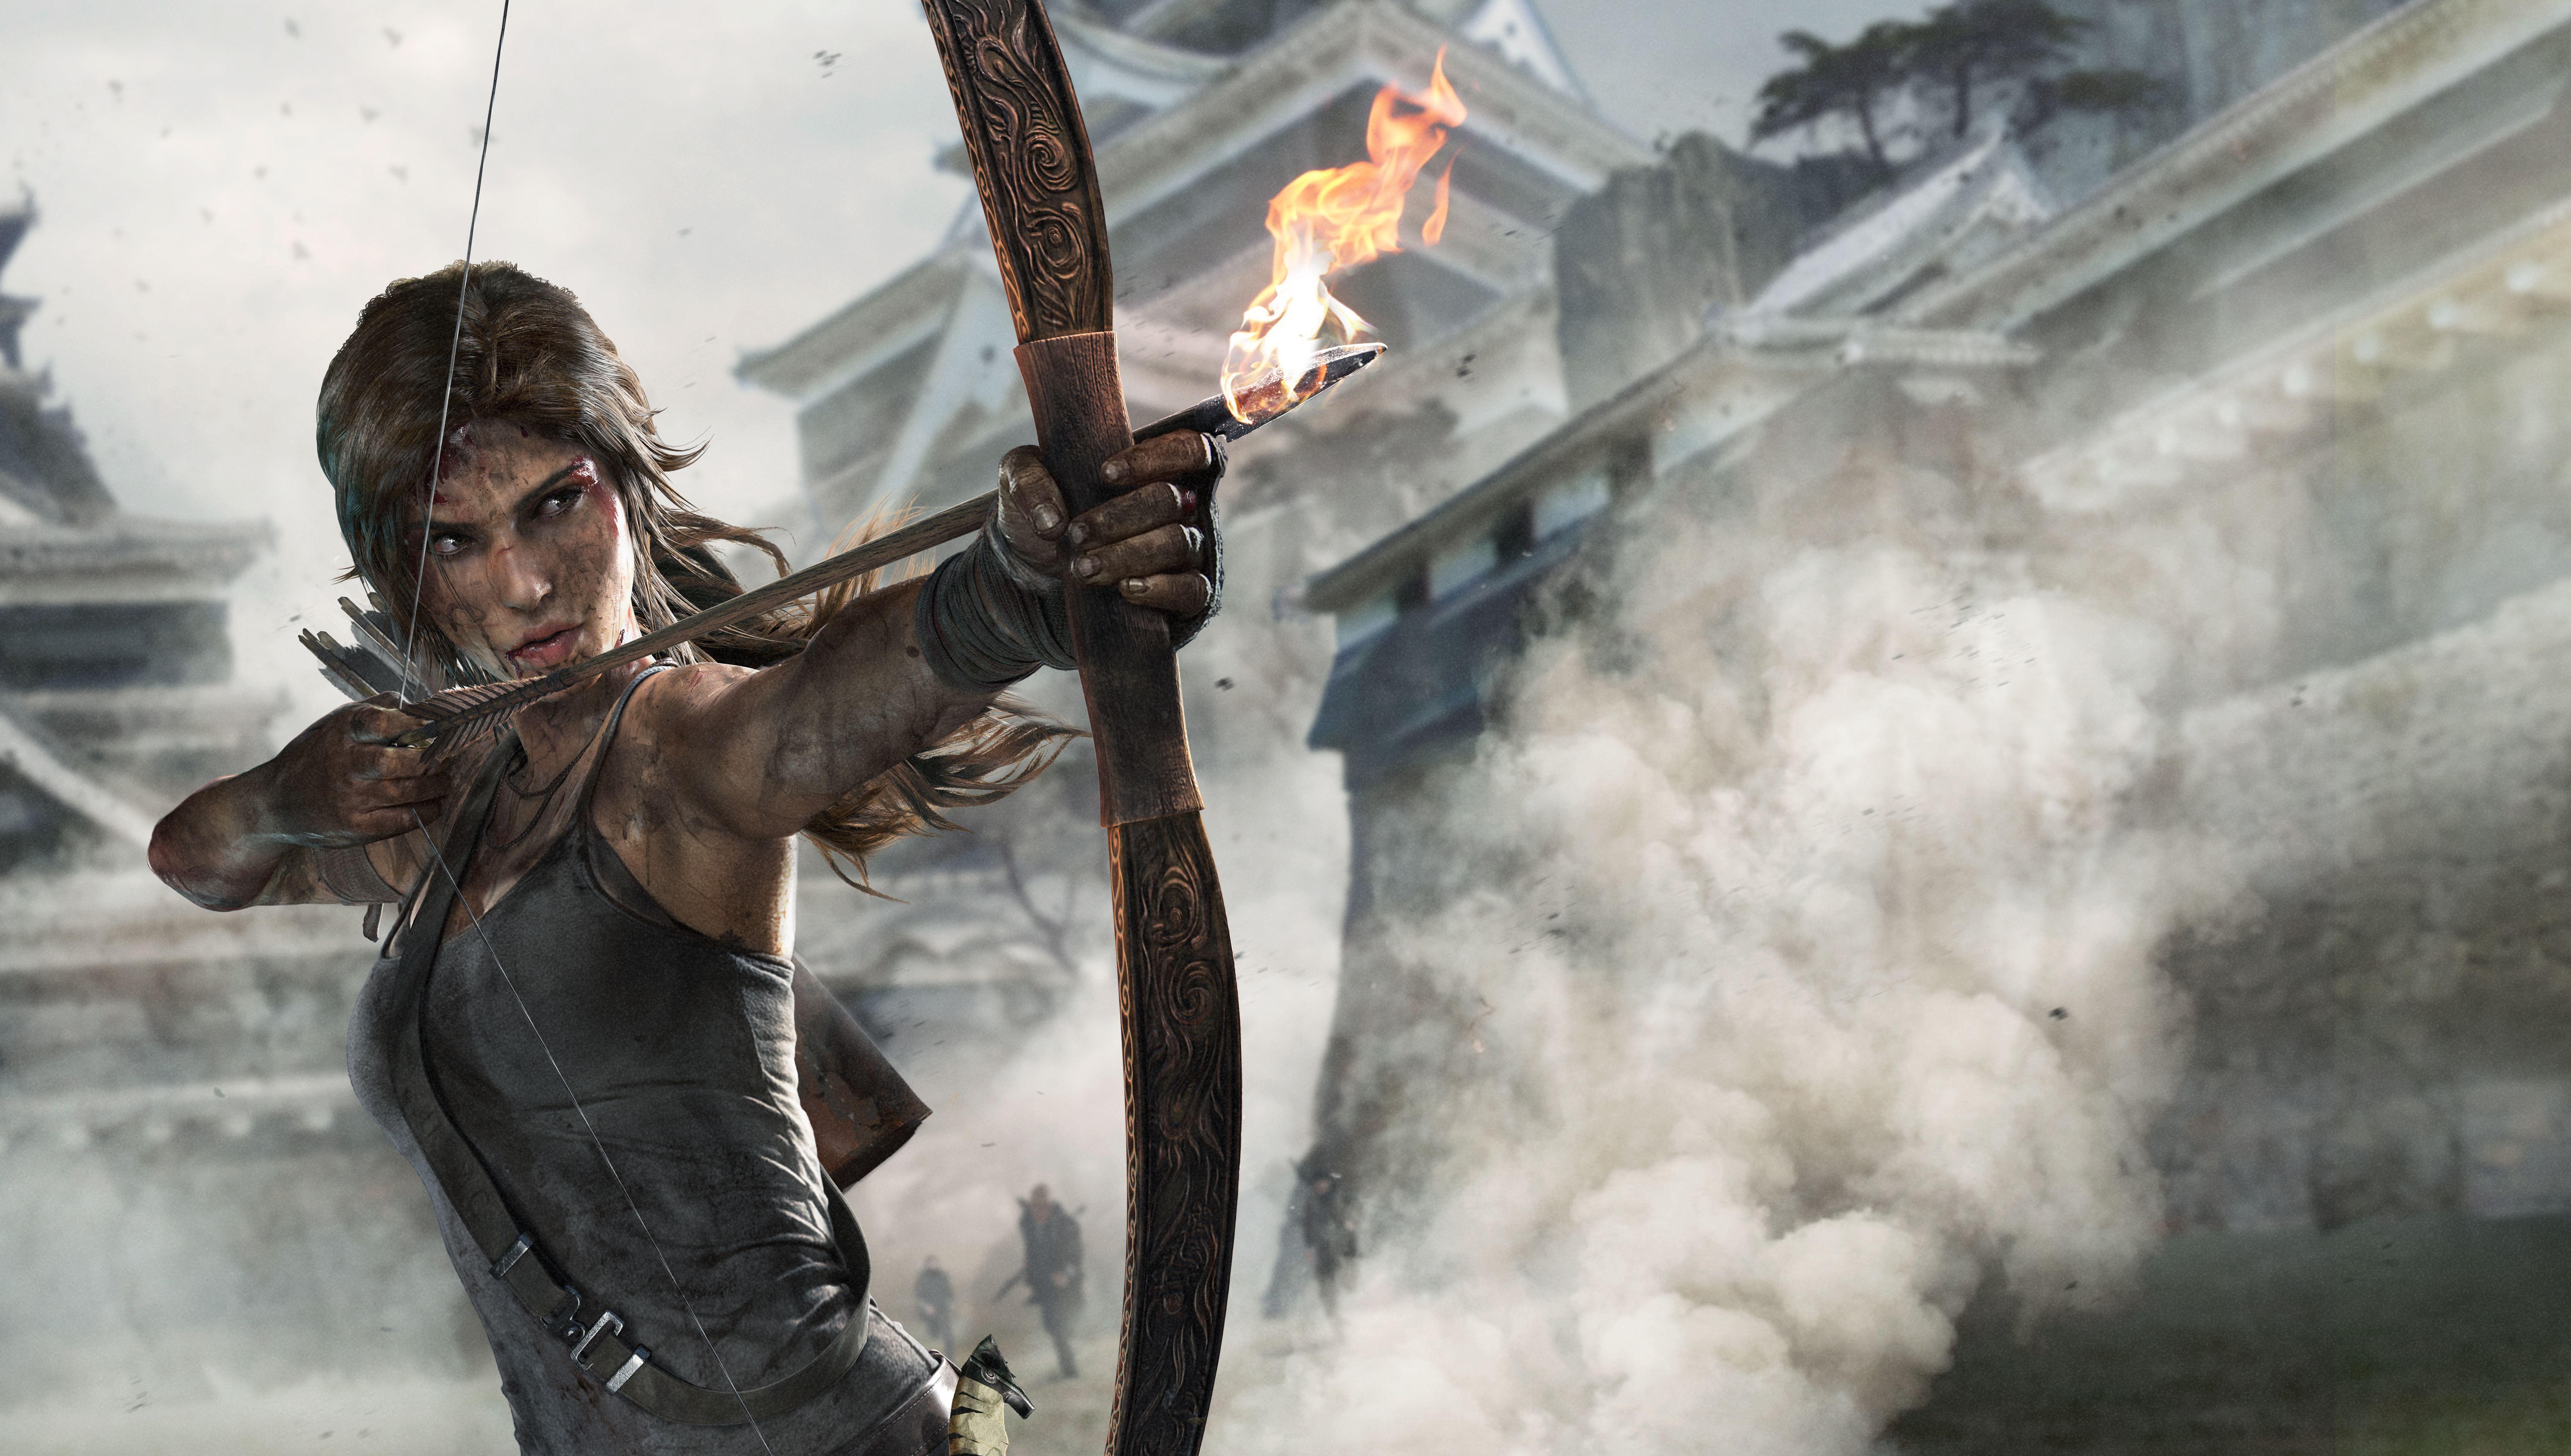 Tomb Raider Game Wallpapers Top Free Tomb Raider Game